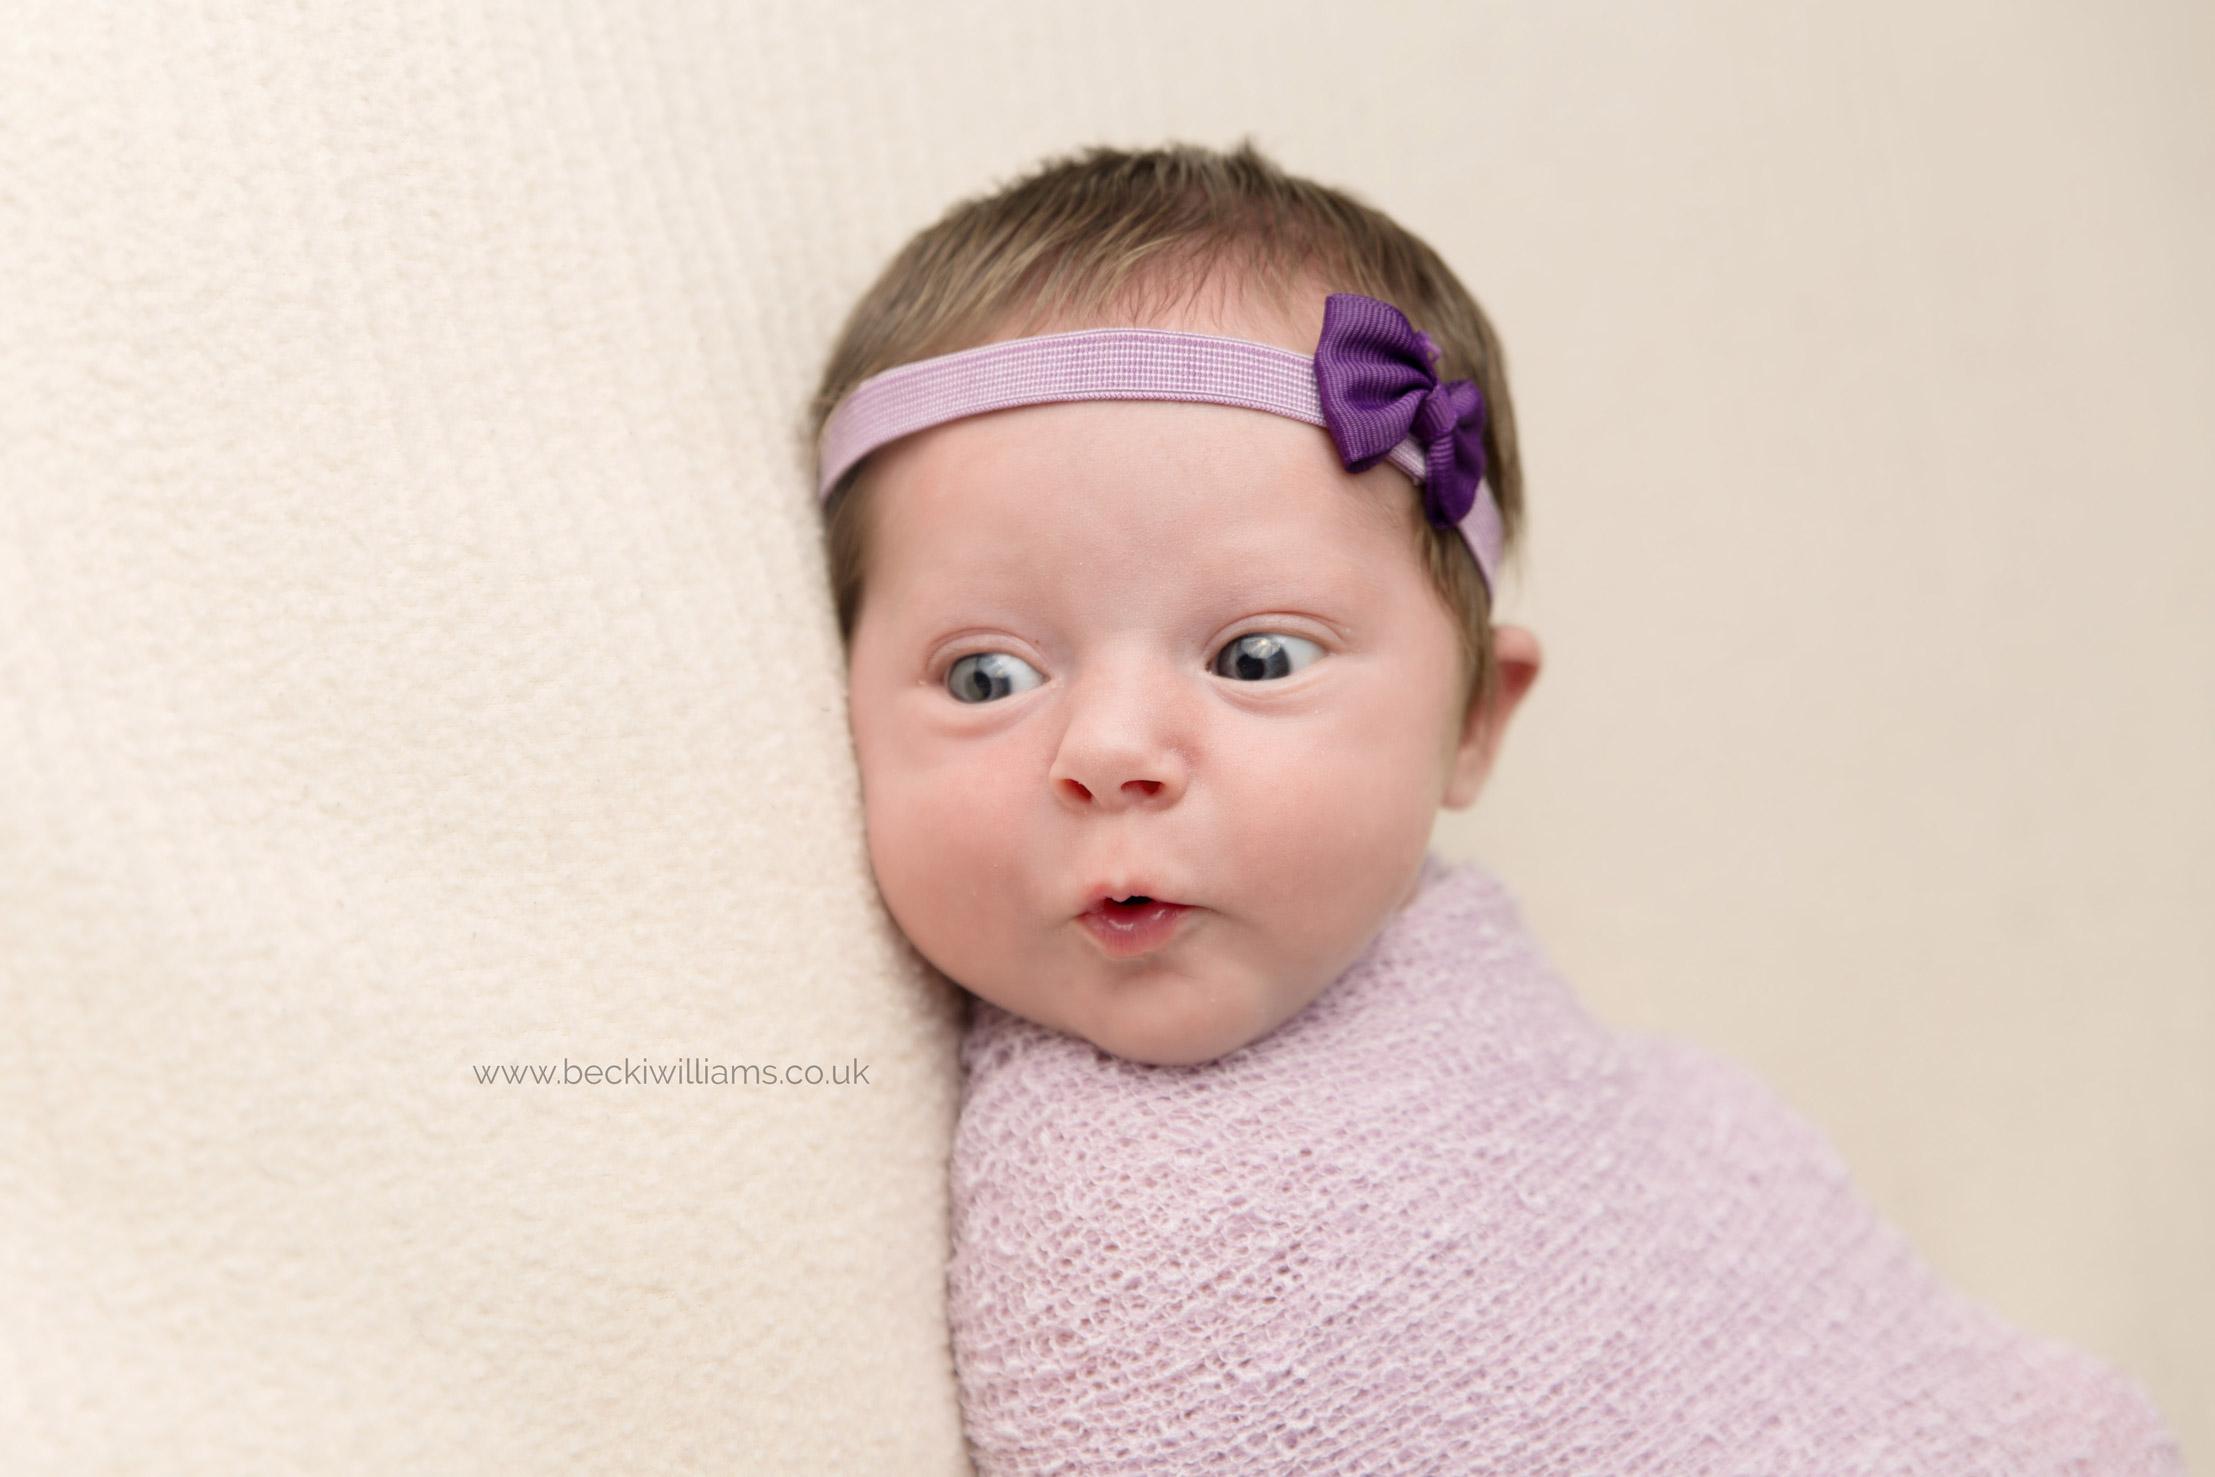 Newborn pulls funny face during her newborn baby photo shoot in Hemel Hempstead